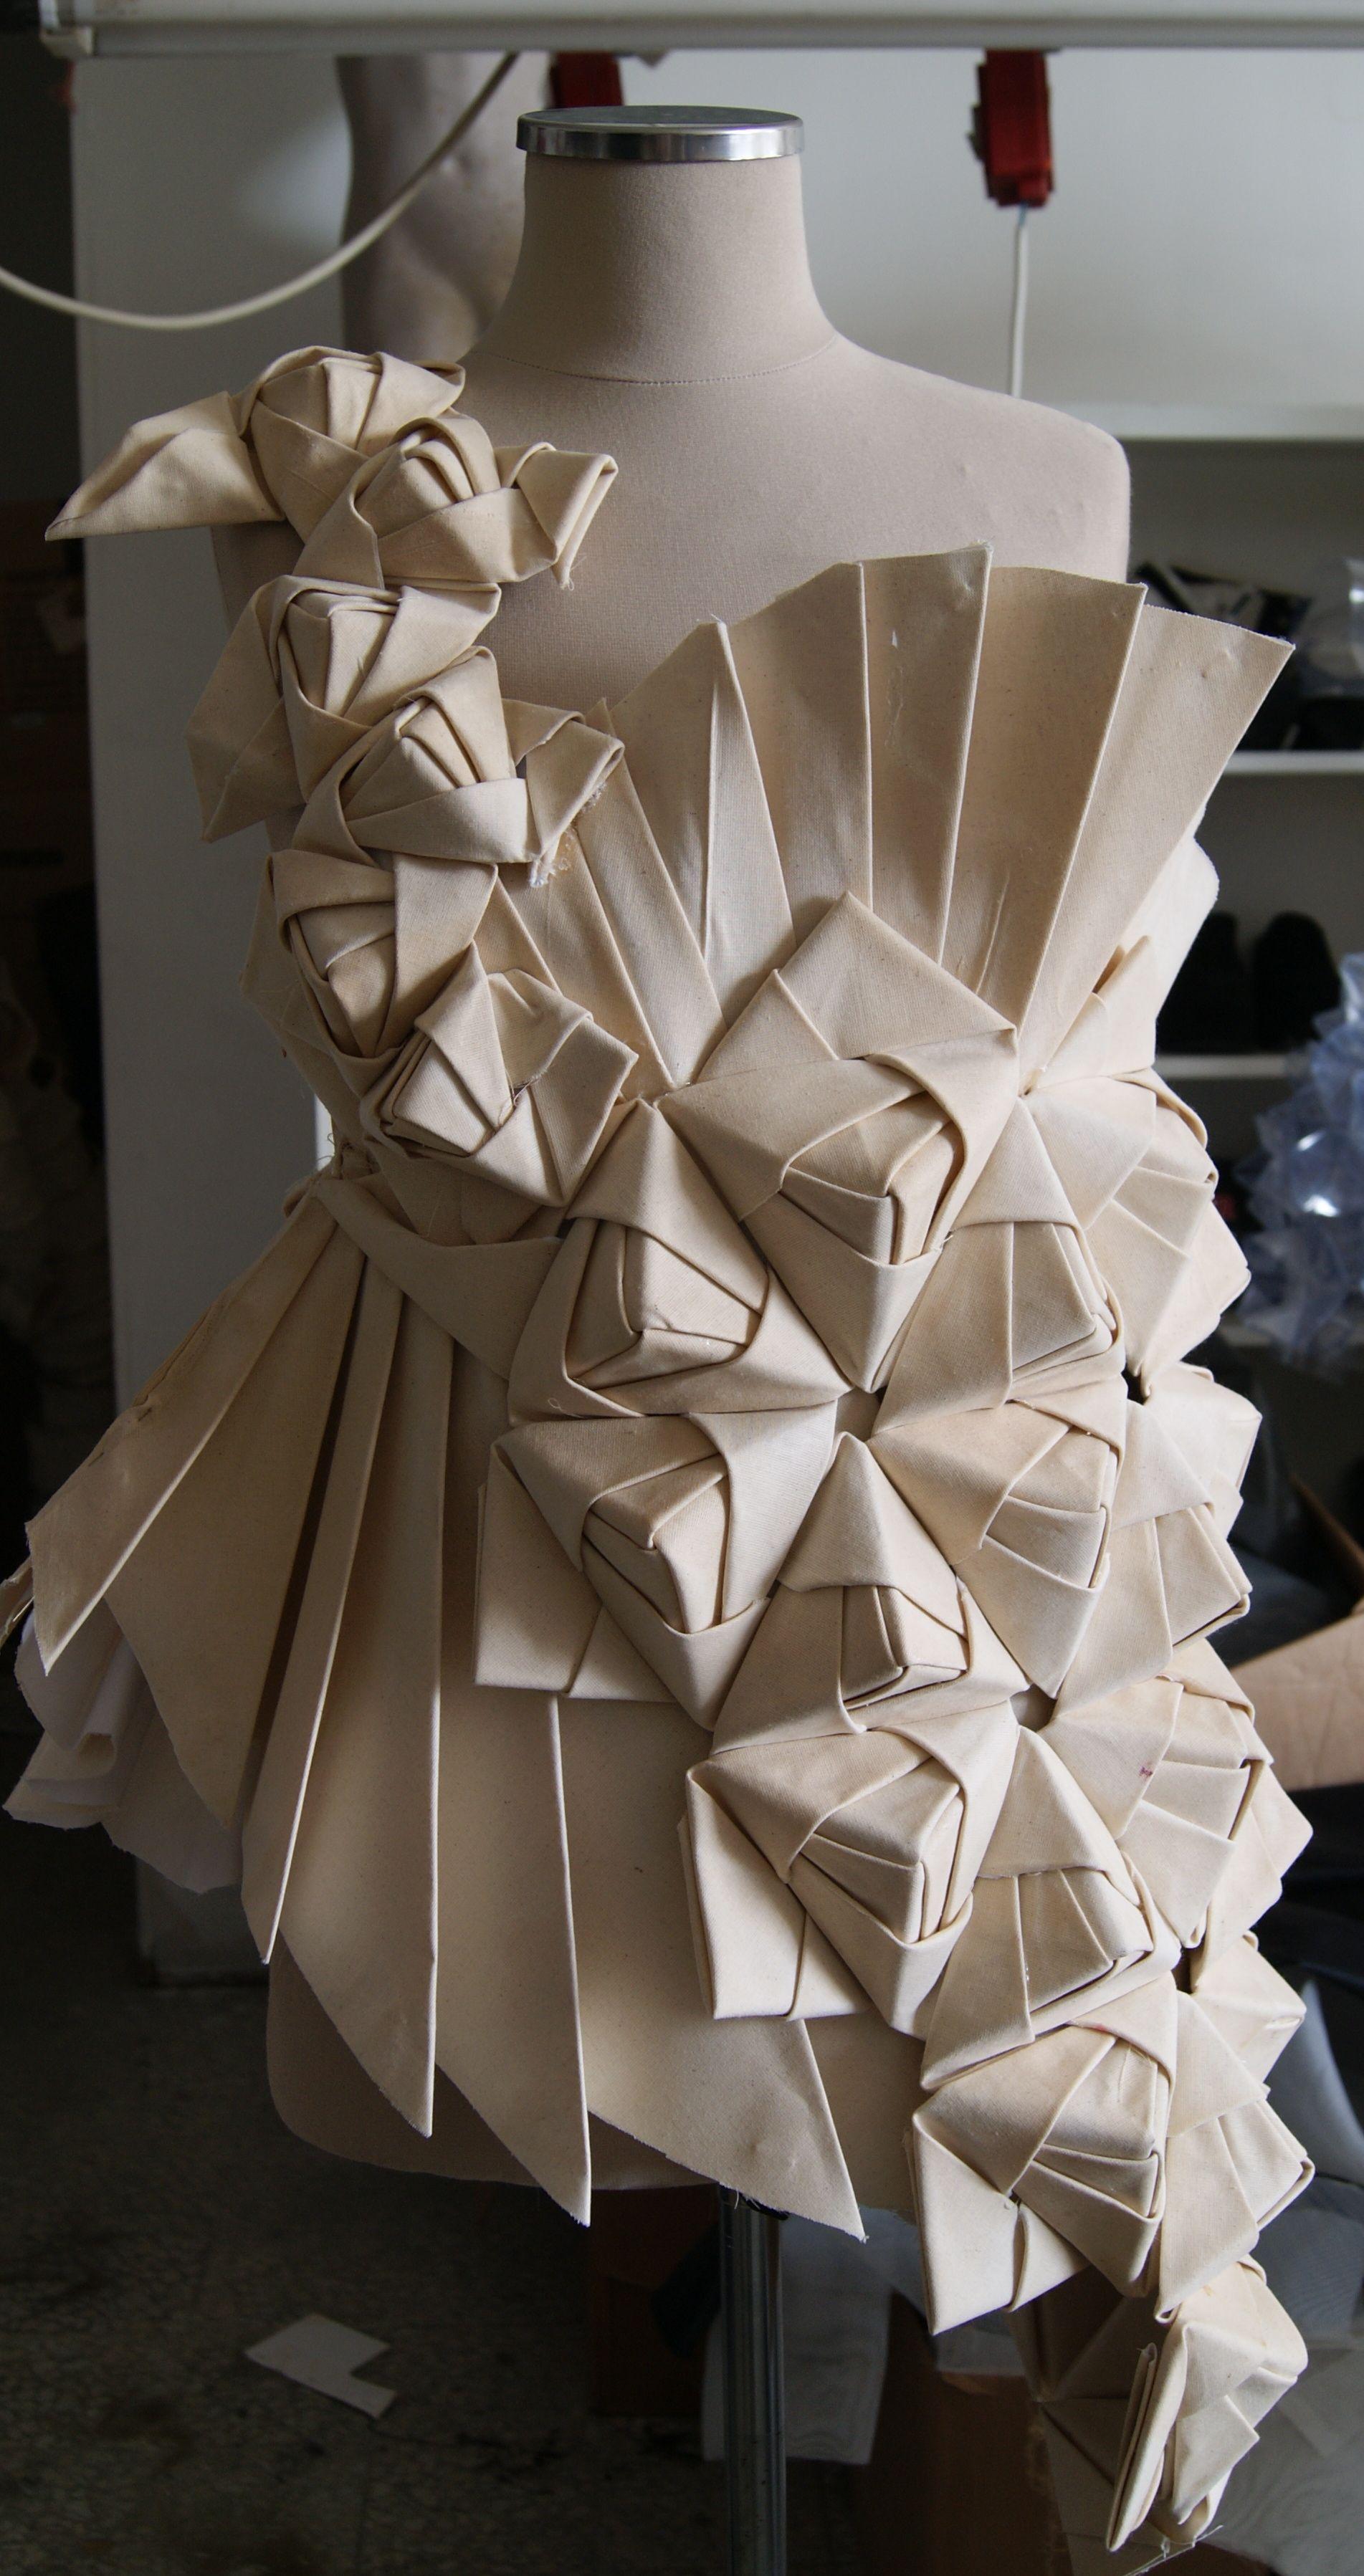 Origami origami pinterest robes longues de soir e moulage et robe long - Robe en origami ...